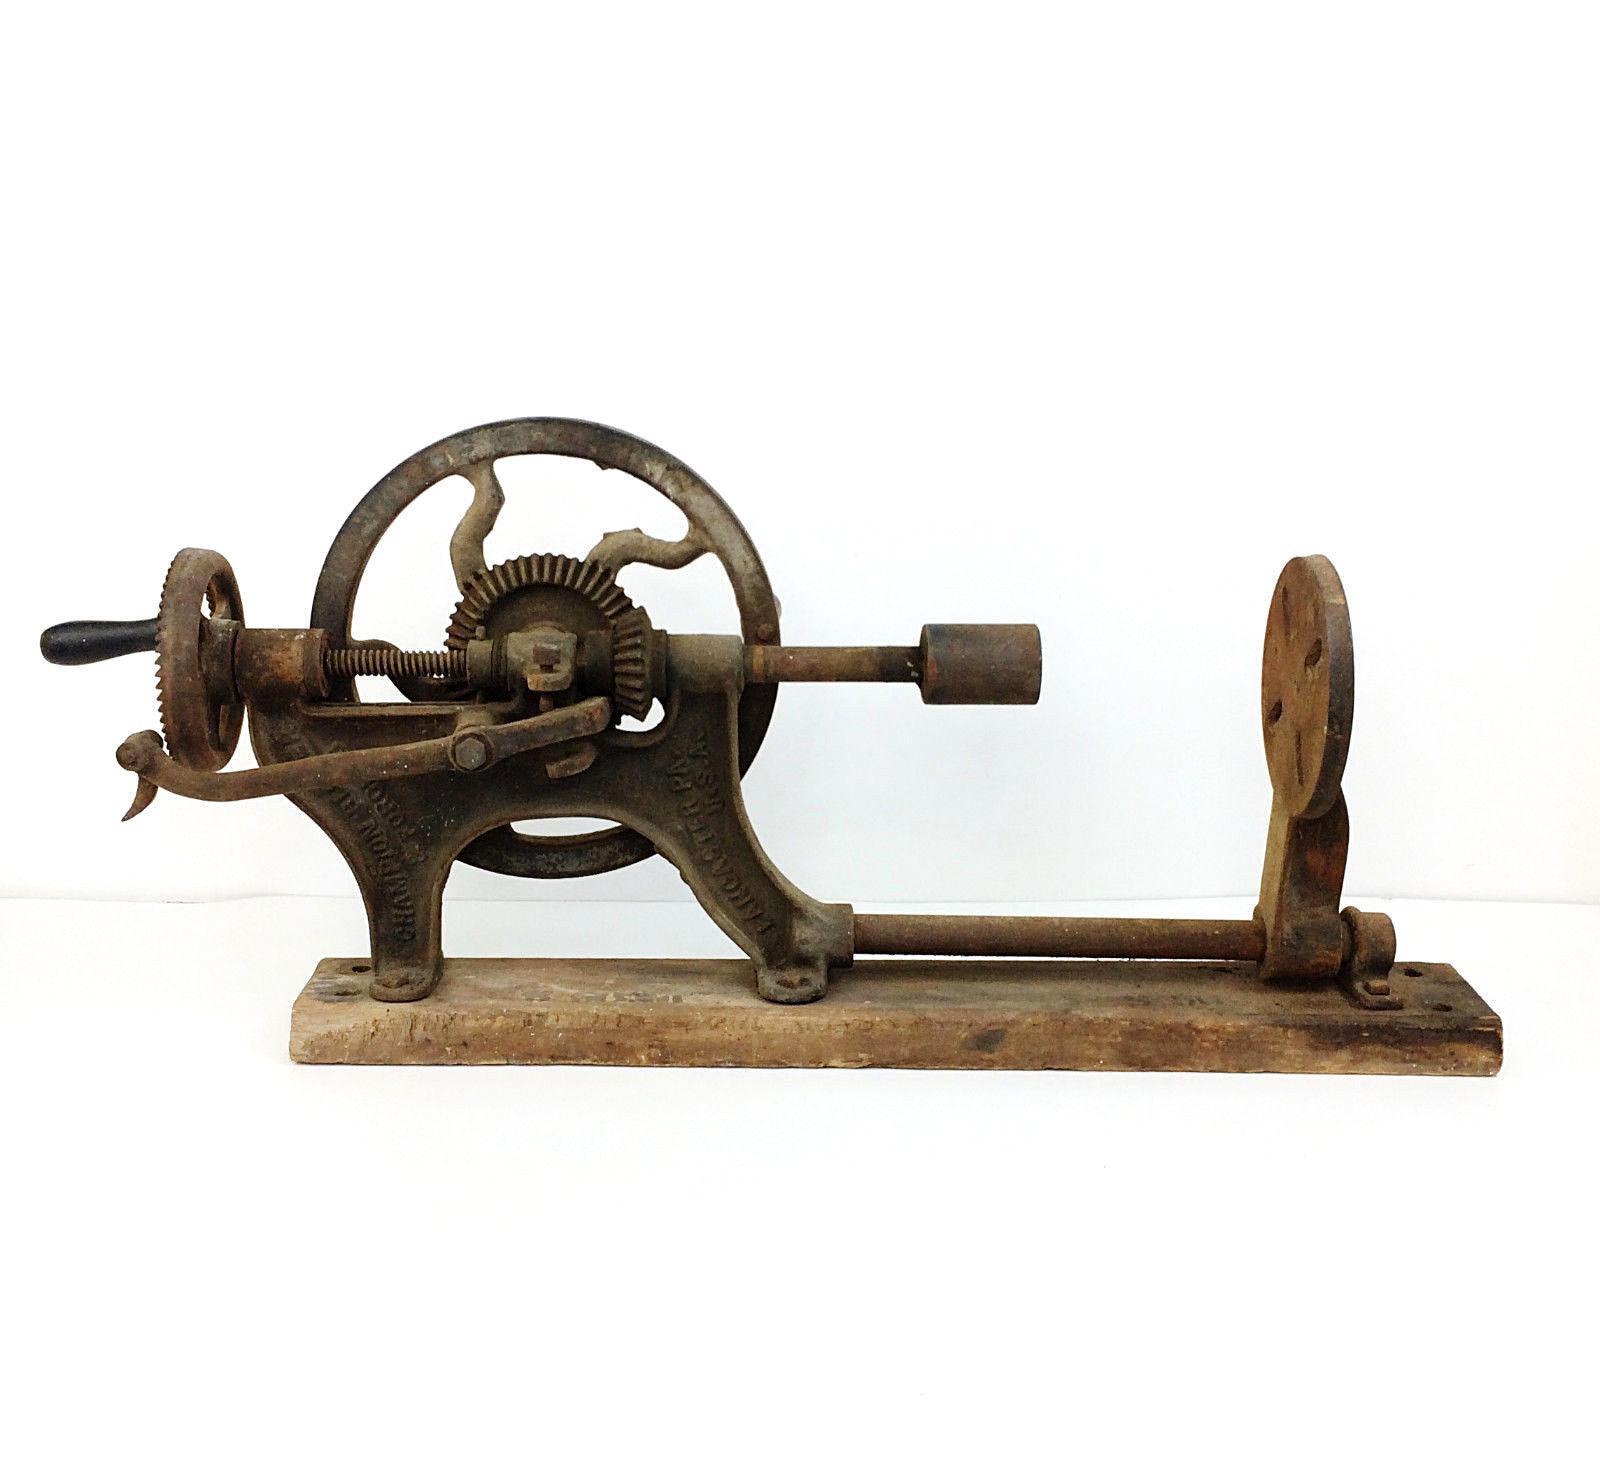 Crank Drill Press